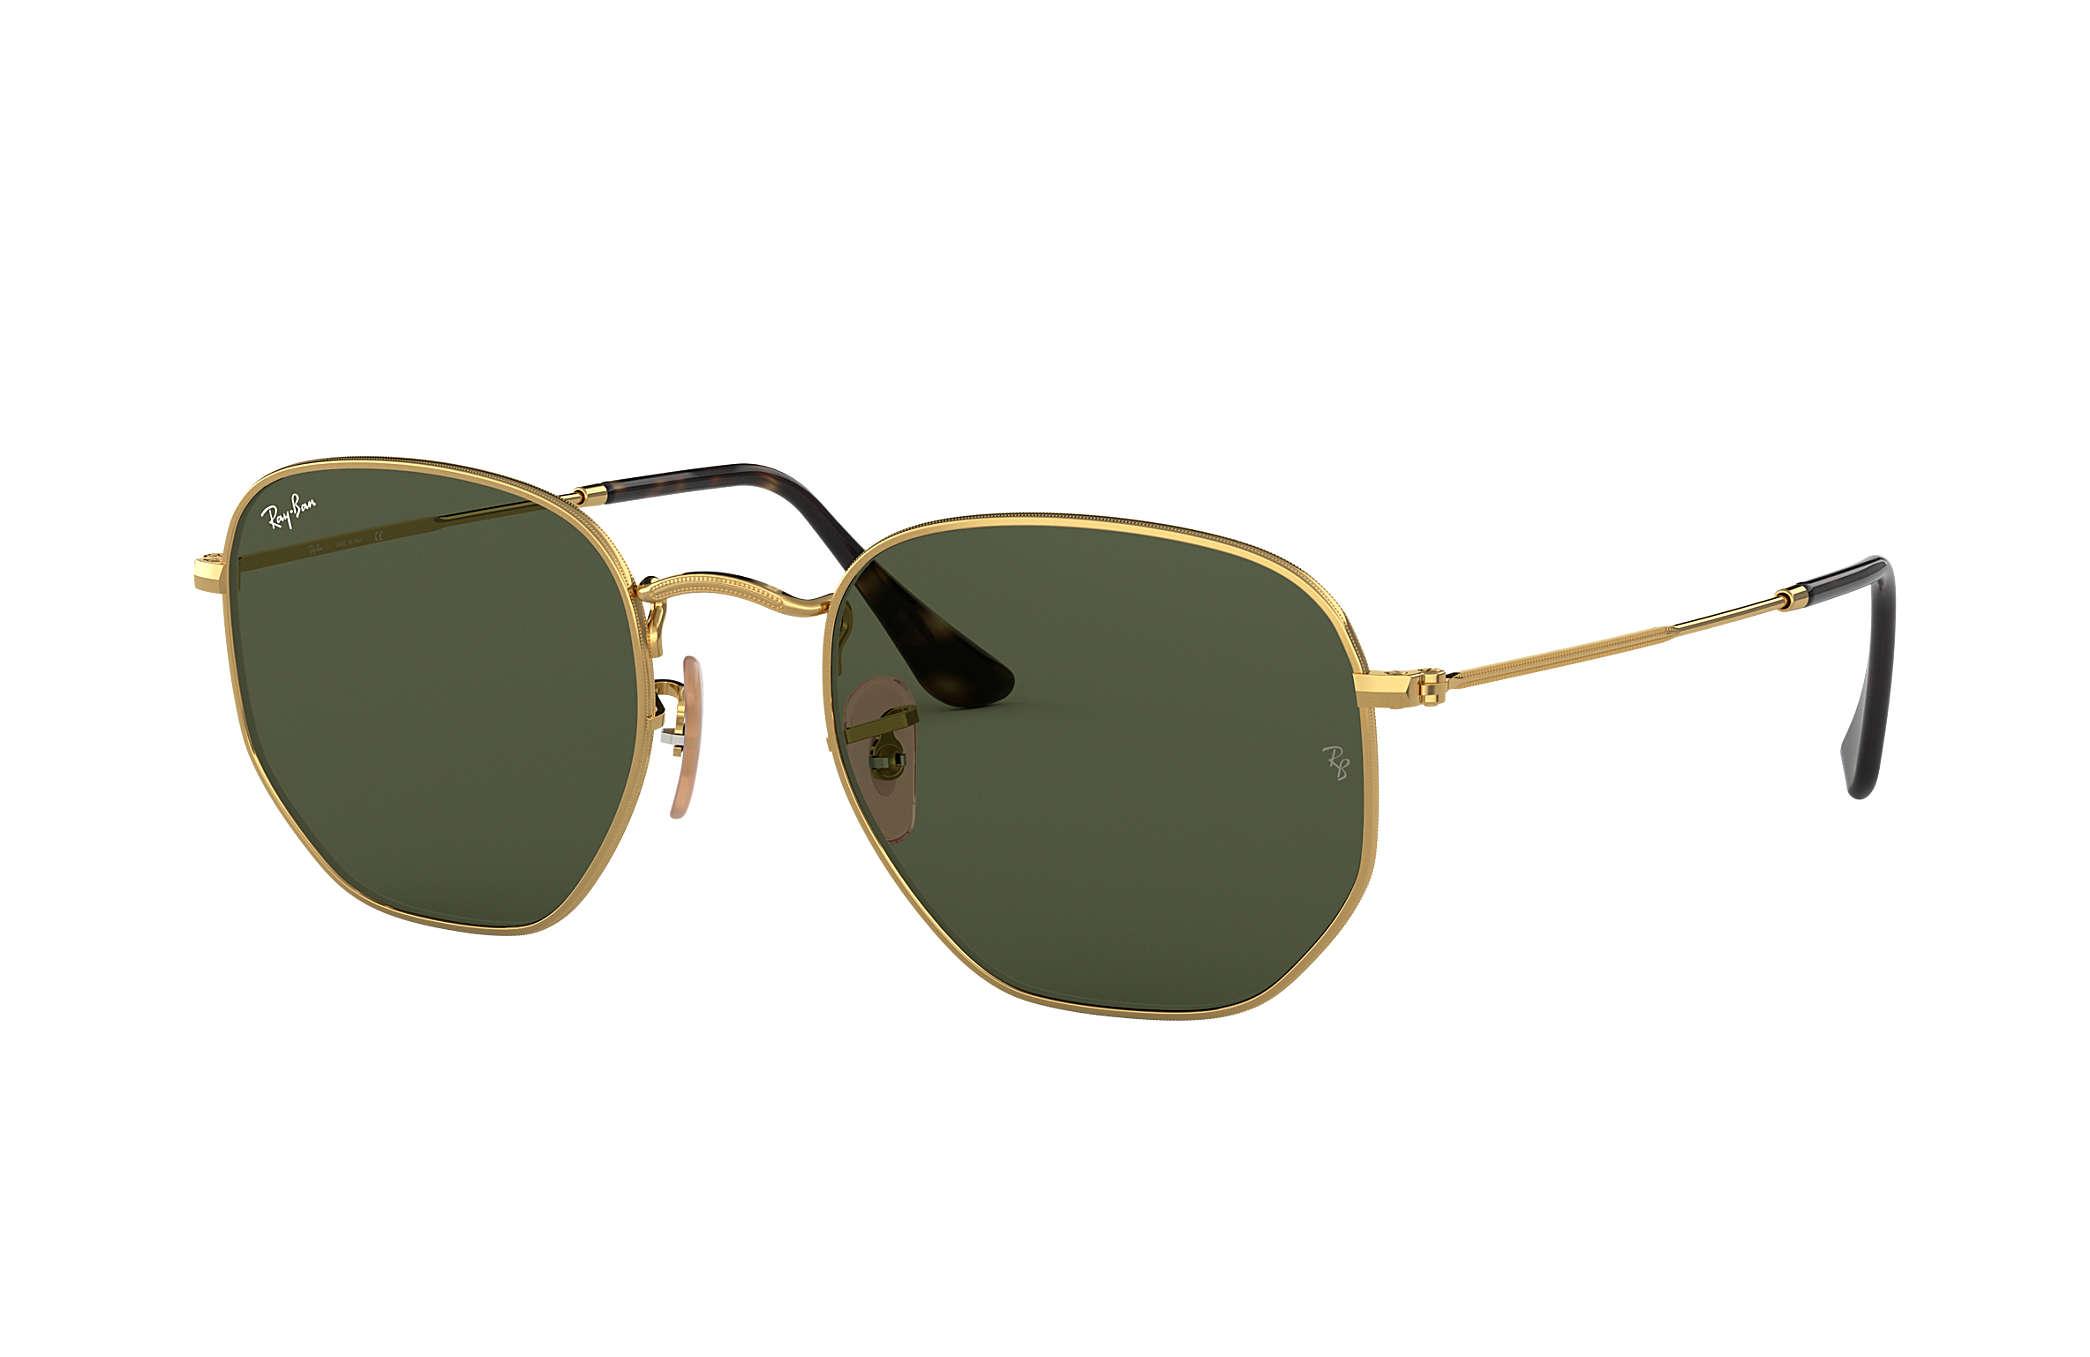 a3a9c03144aae Ray-Ban Hexagonal Flat Lenses RB3548N Gold - Metal - Green Lenses ...